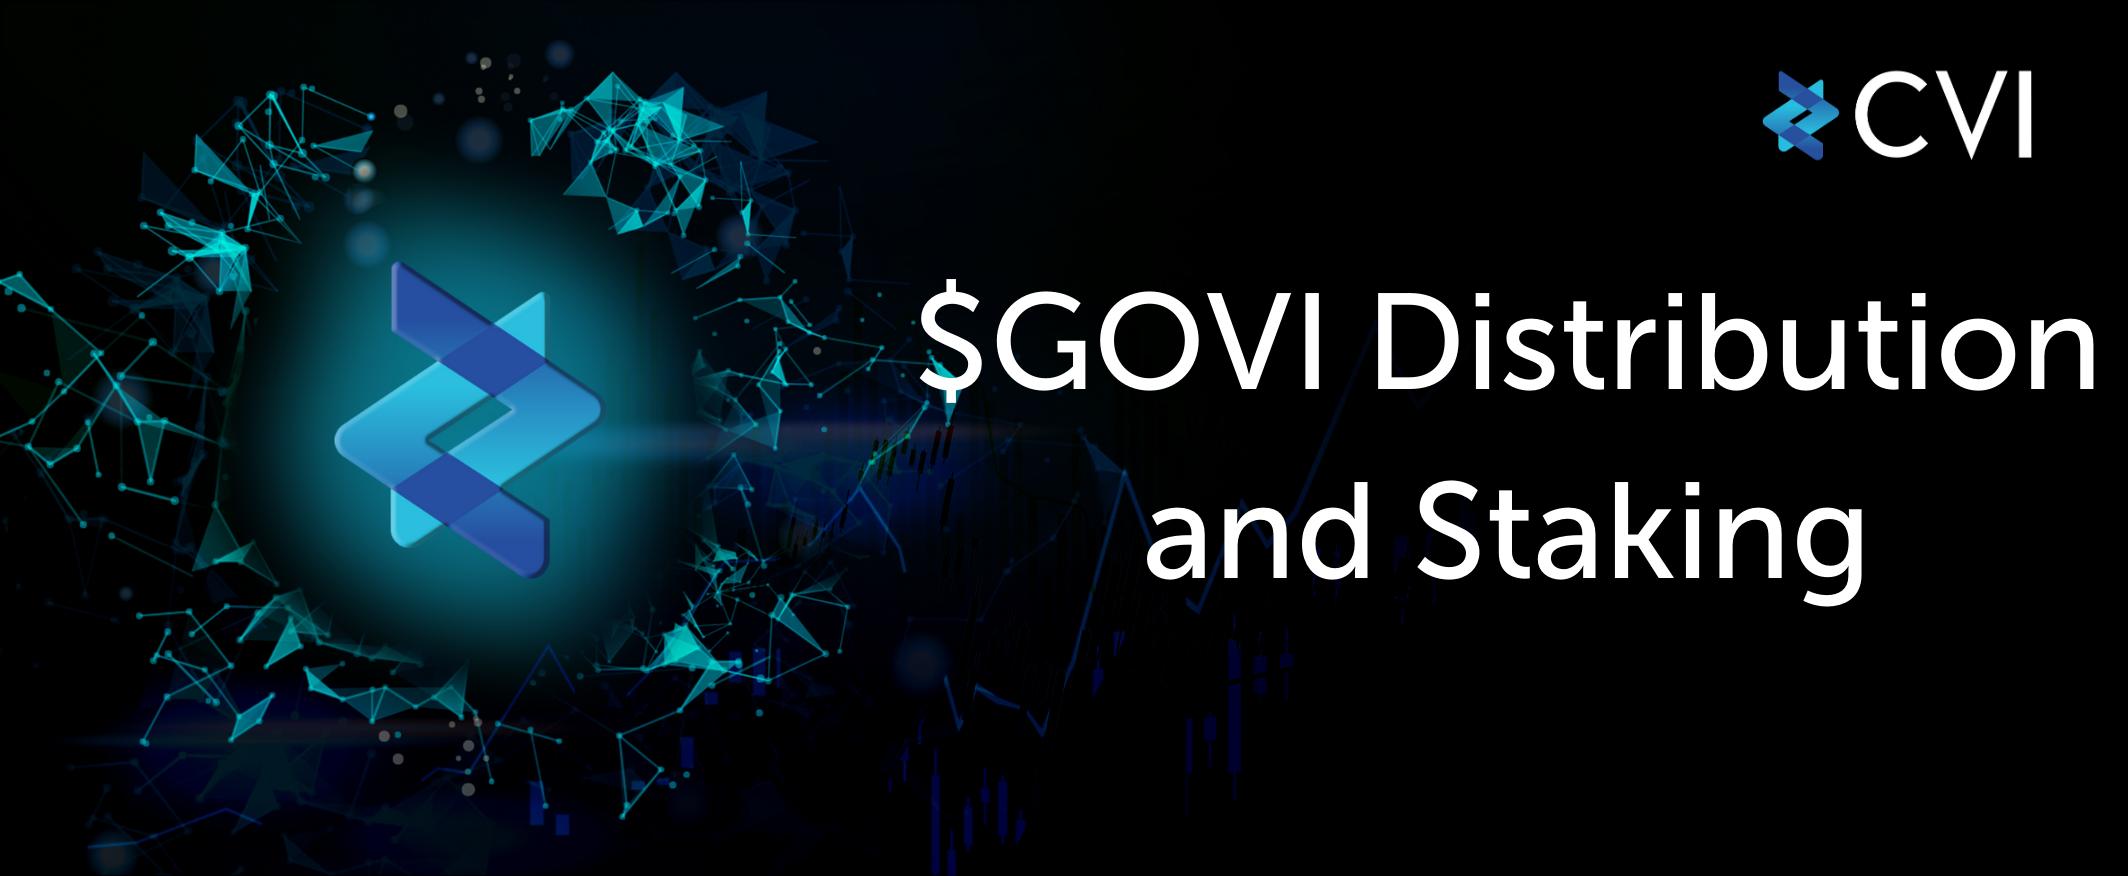 Let's earn $ETH and $USDT by staking $GOVI tokens on cvi.finance